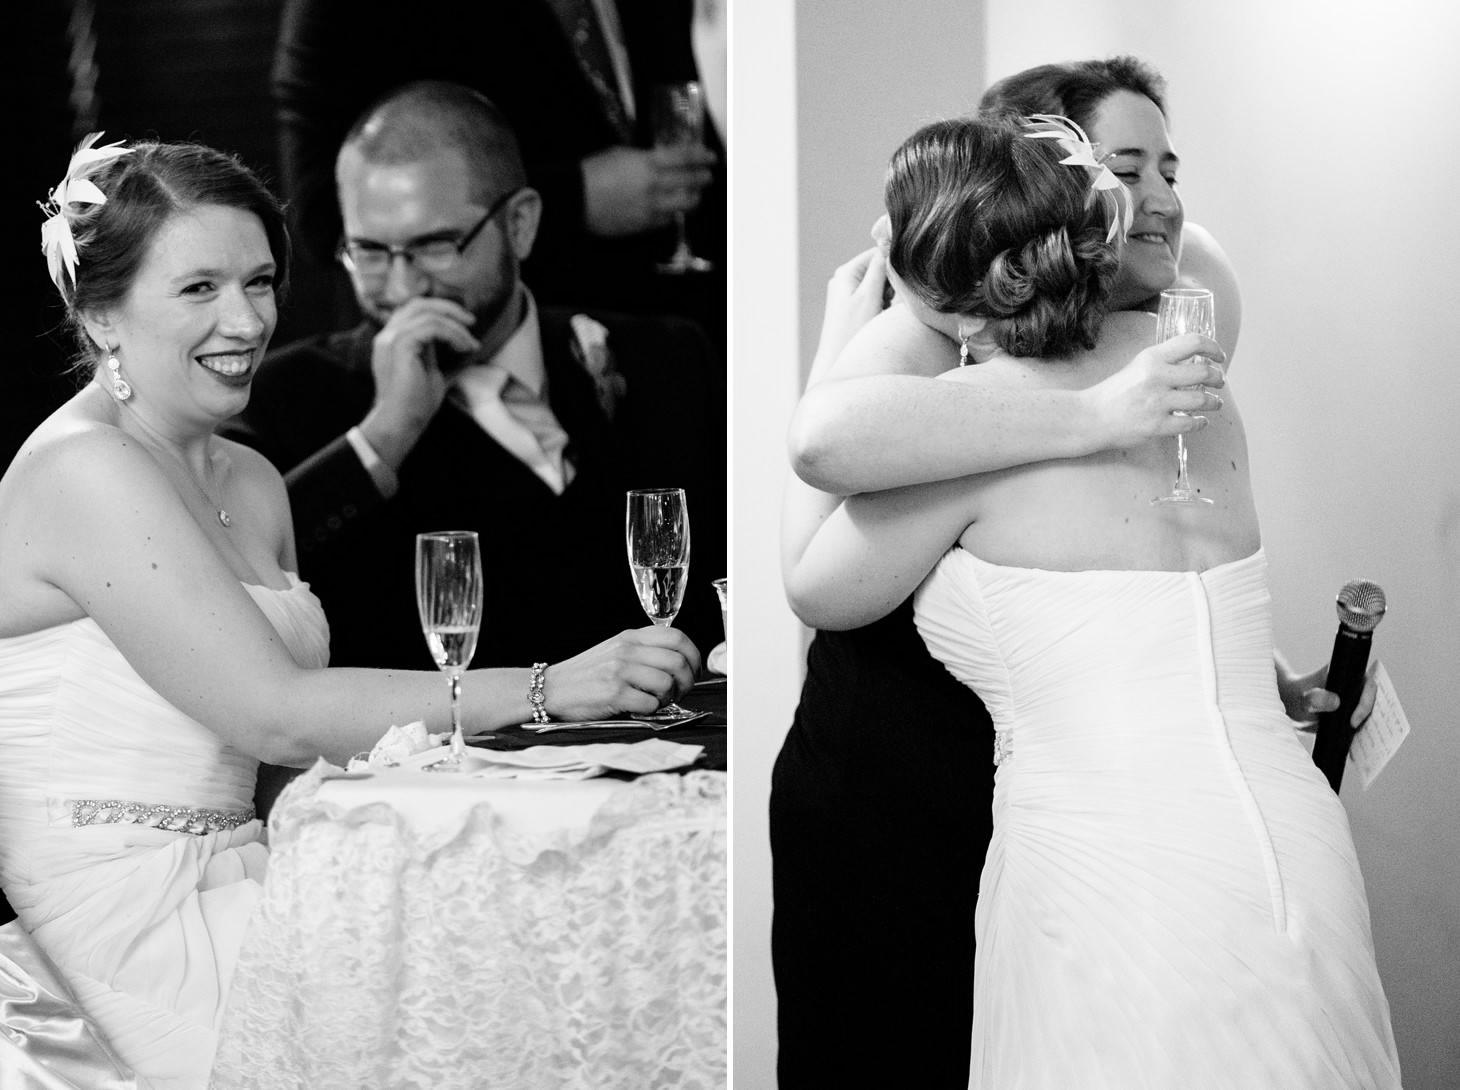 035-nyc-wedding-photographer-nj-nerdy-dr-who-firehouse-wedding-smitten-chickens.jpg